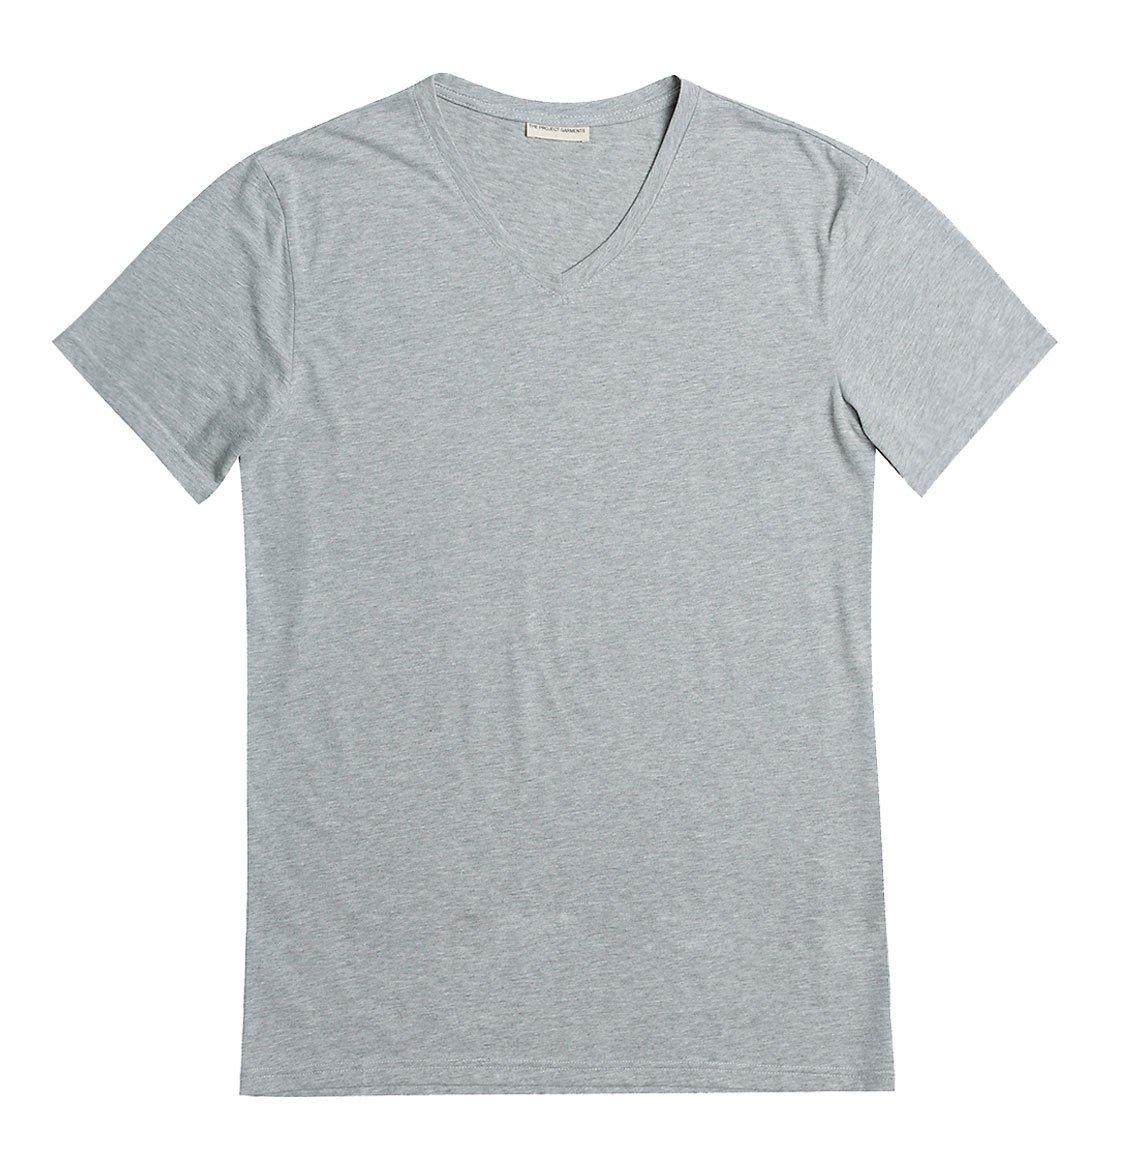 The Project Garments Organic Cotton V-neck T-shirt Melange Grey